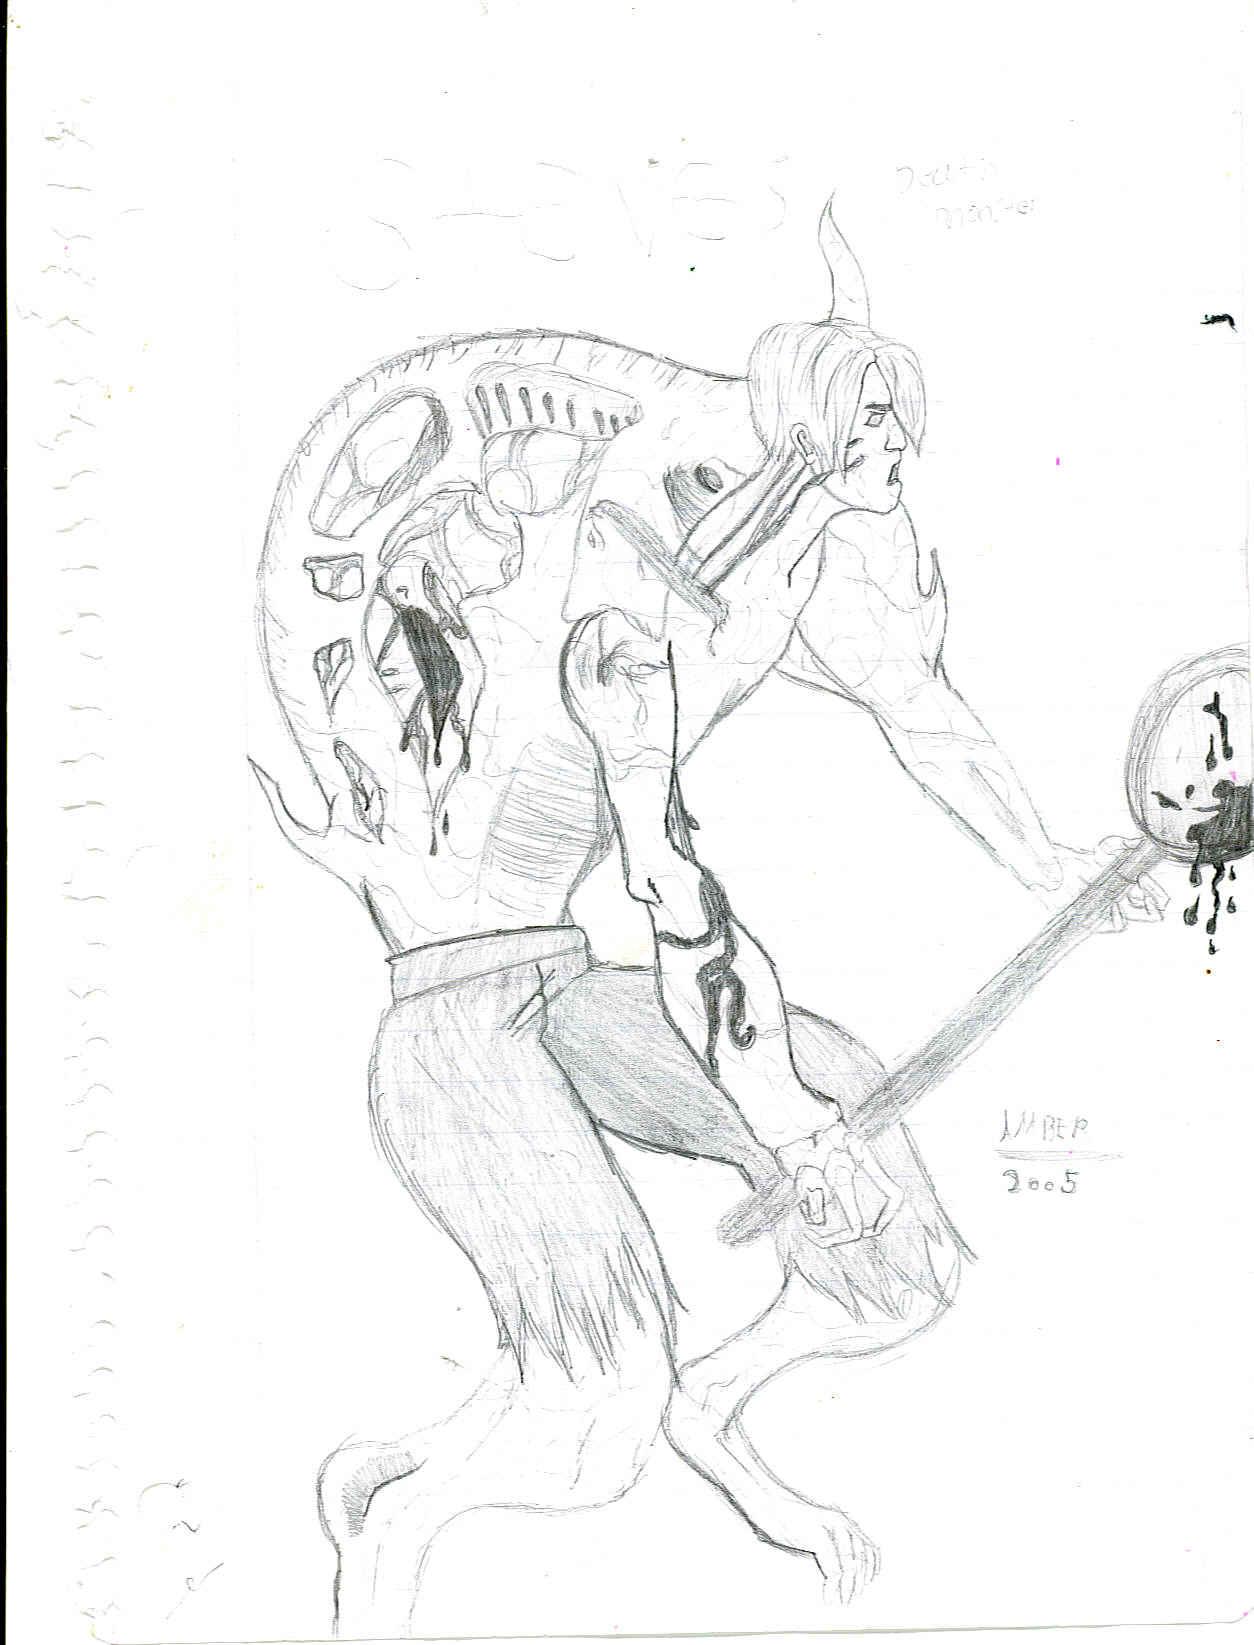 Steve Meet's His Doom(Tyrant) by resident_evil_fan_